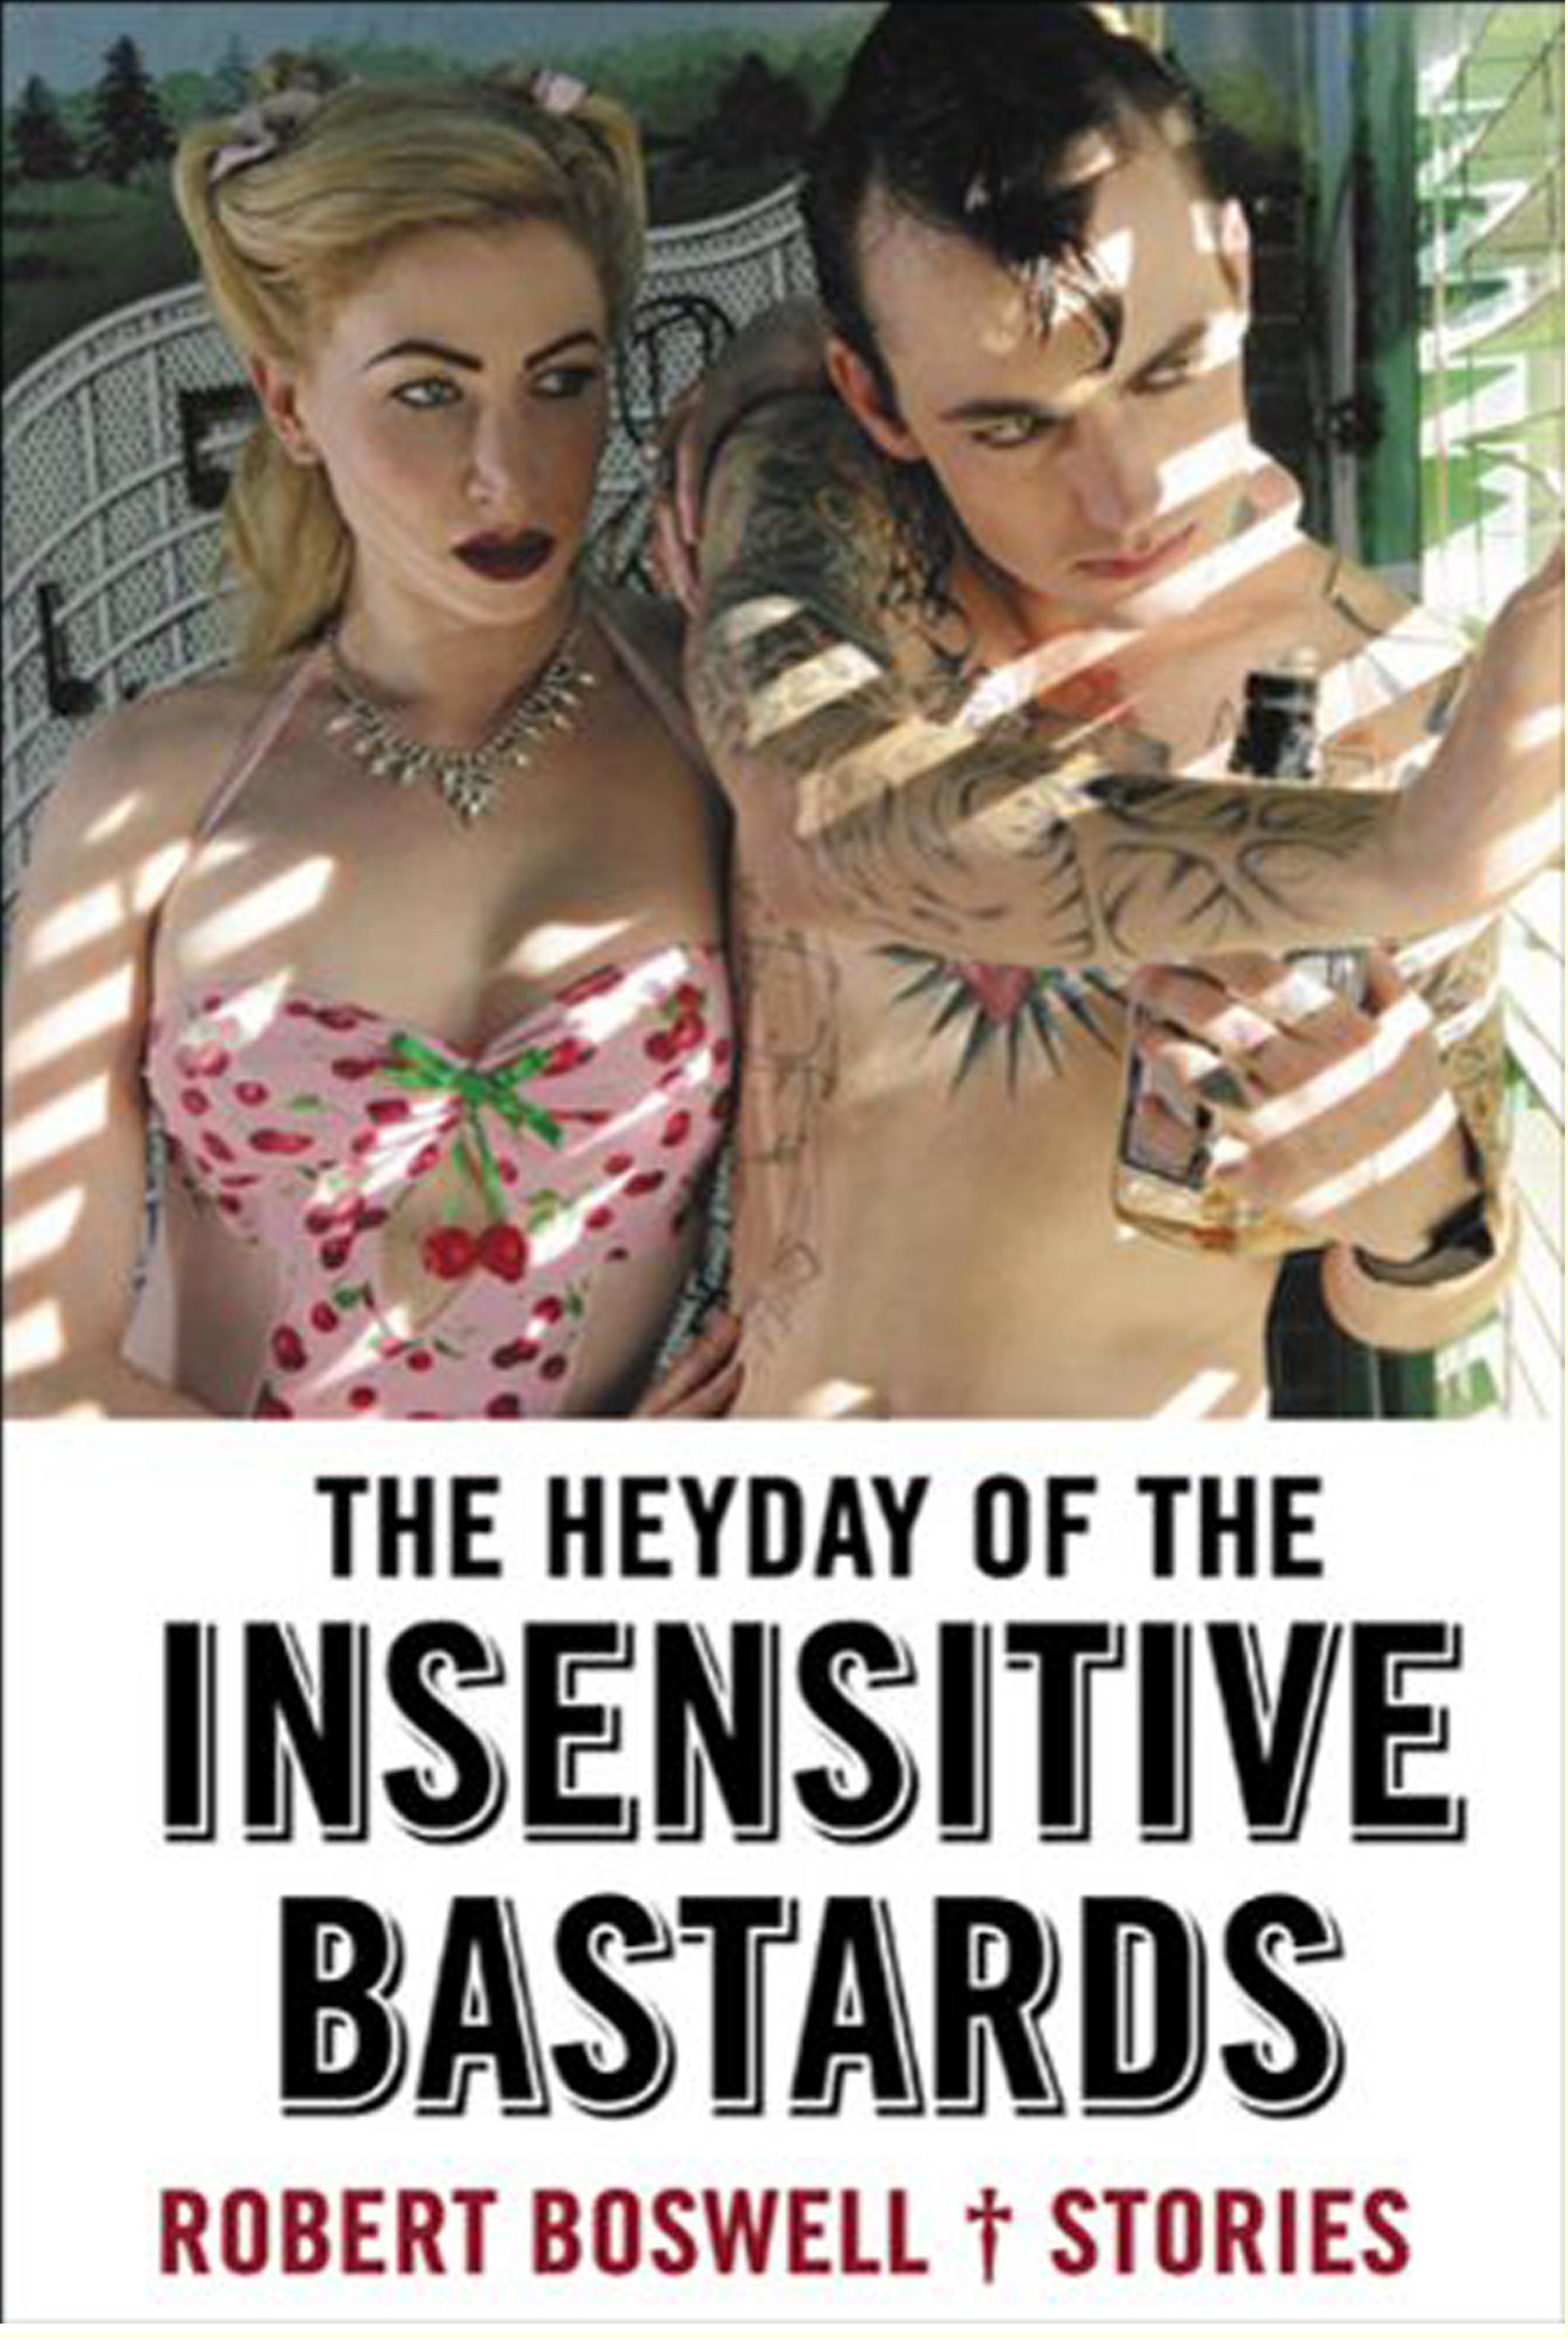 The Heyday of the Insensitive Bastards kapak